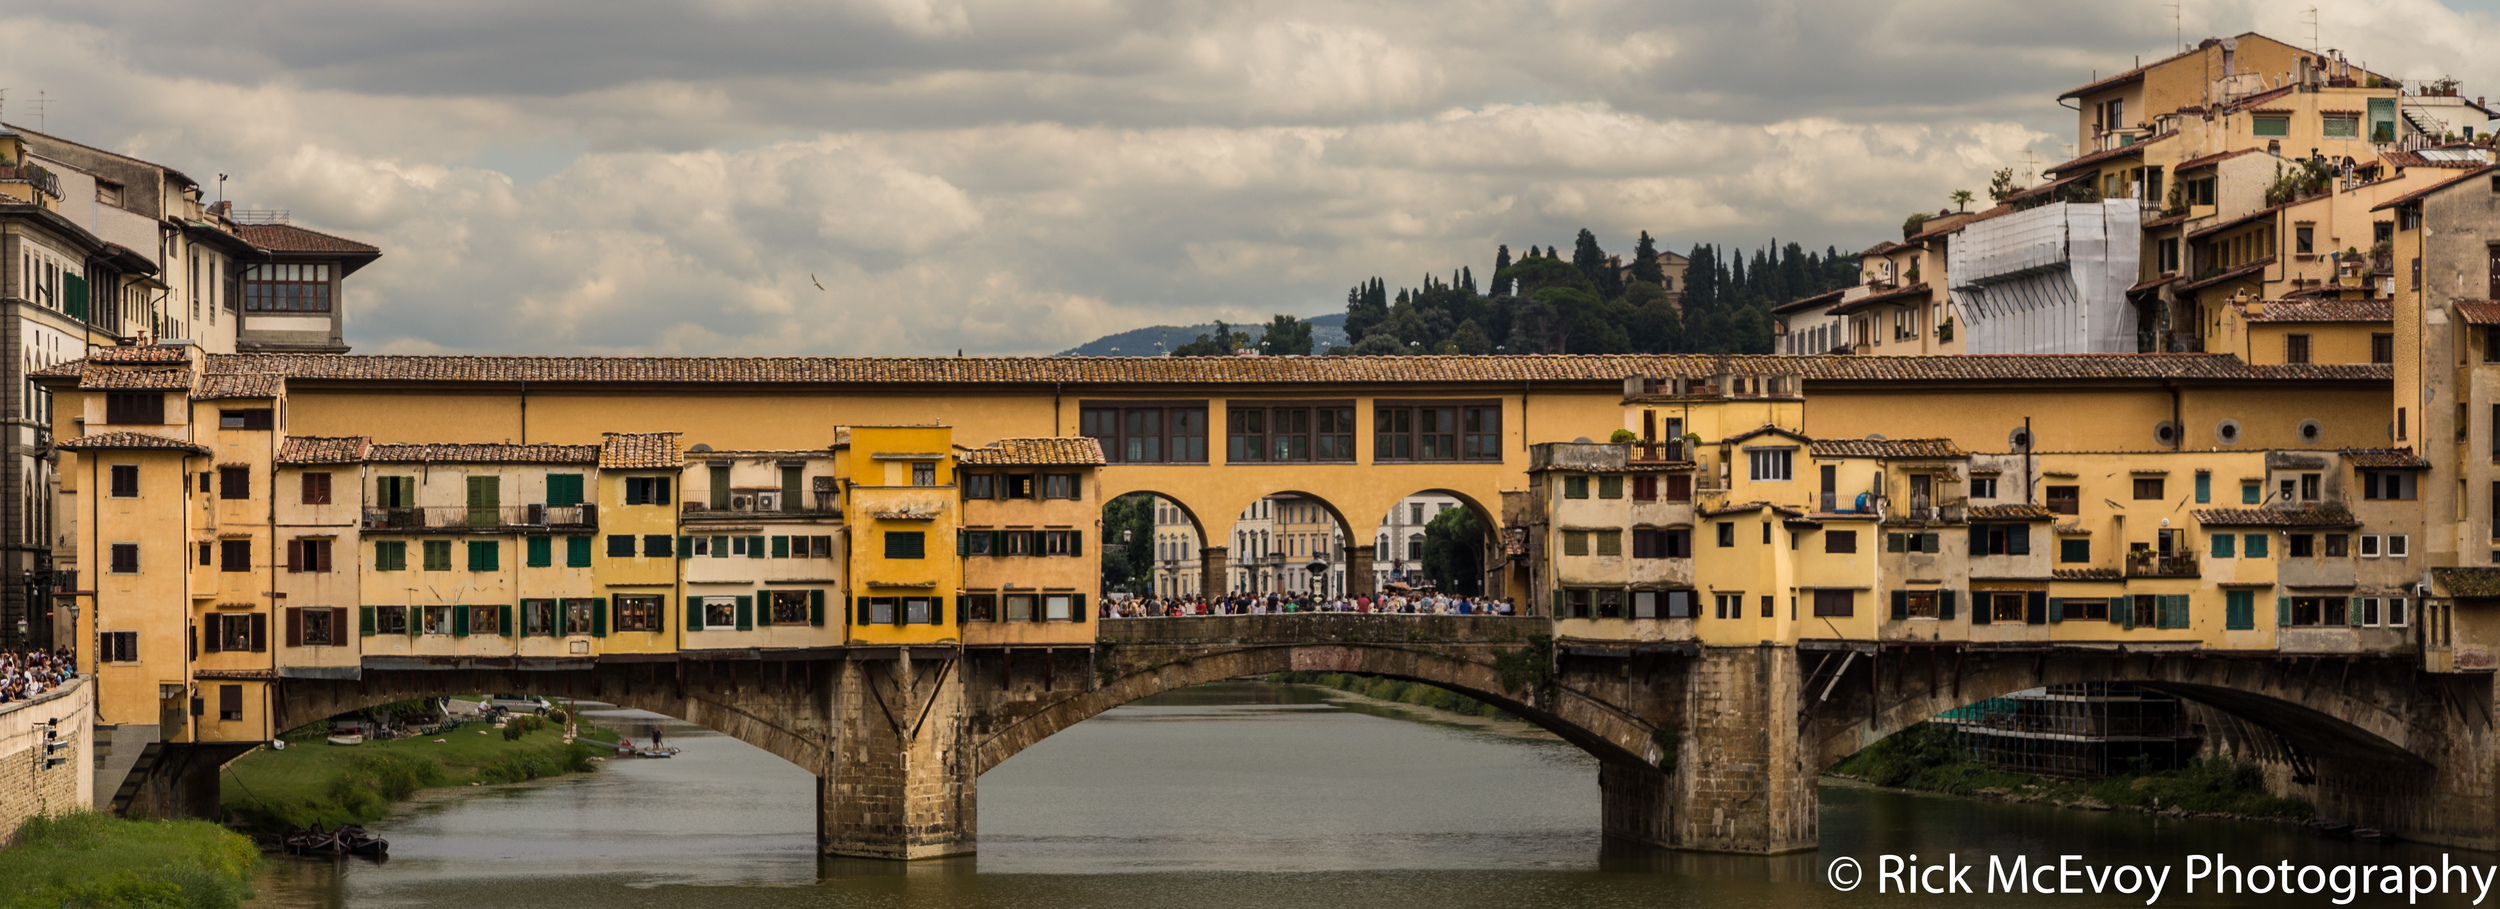 Ponte Vecchio - cropped image